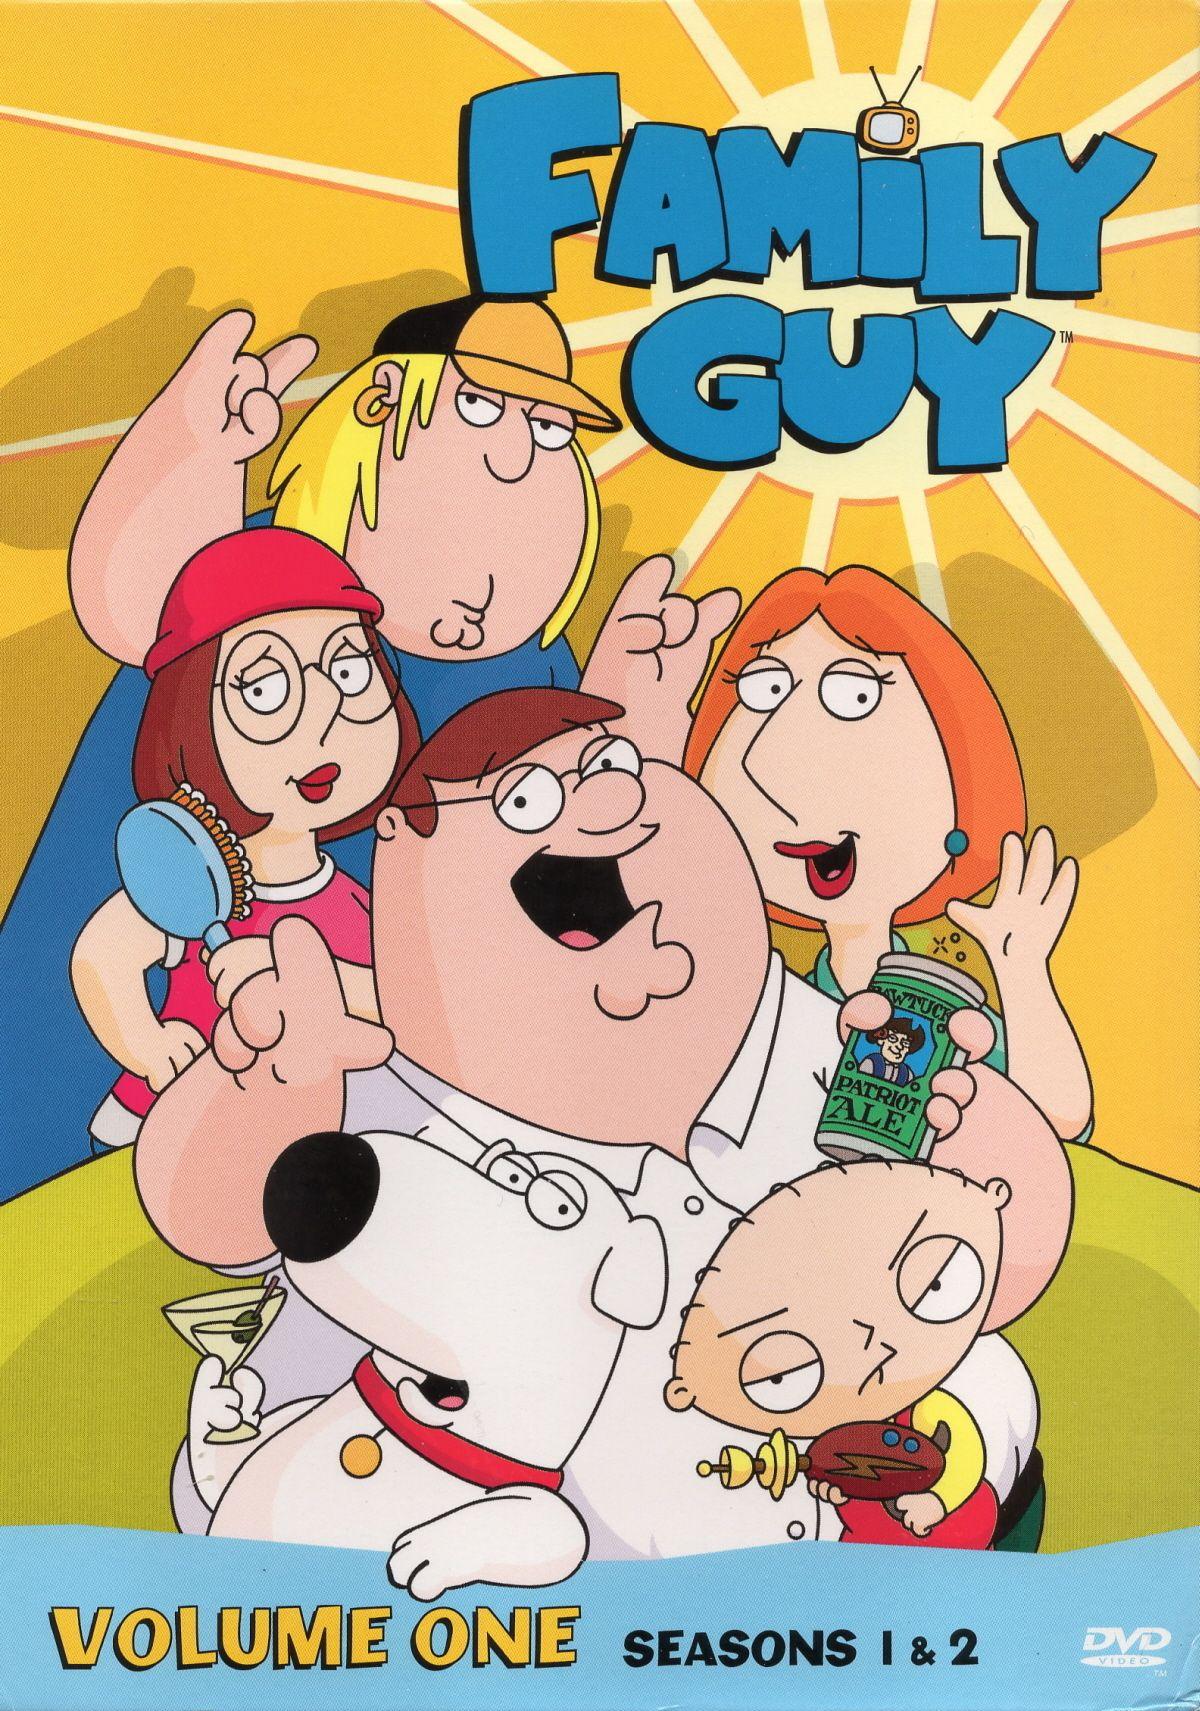 Family Guy Season 1 & 2 (1999) Family guy season